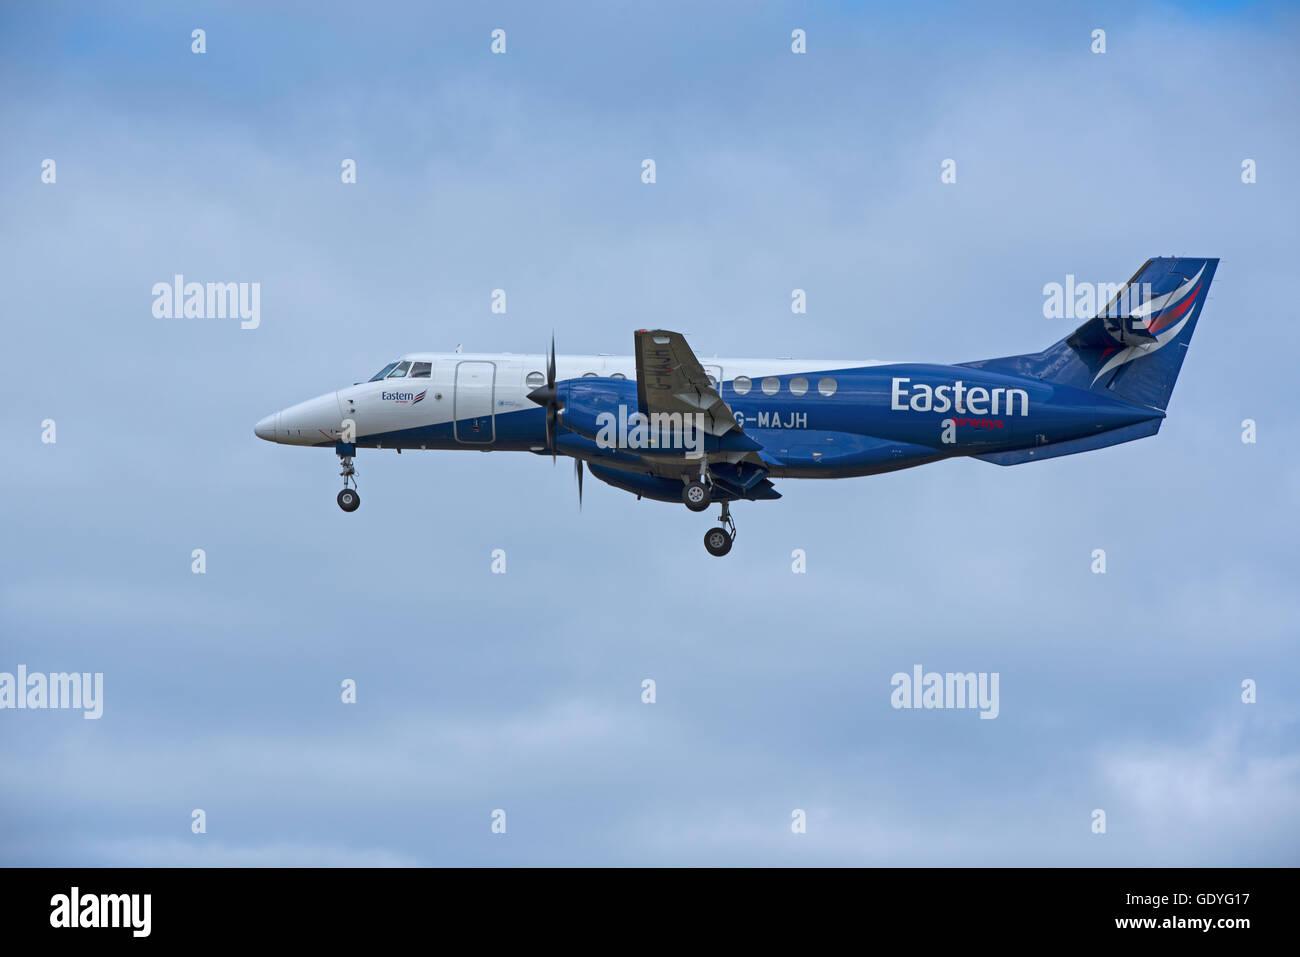 Eastern Airways British Aerospace Jetstream 41-MAJH arriving at RAF Lossiemouth, Moray. Scotland. UK.  SCO 10,768. - Stock Image